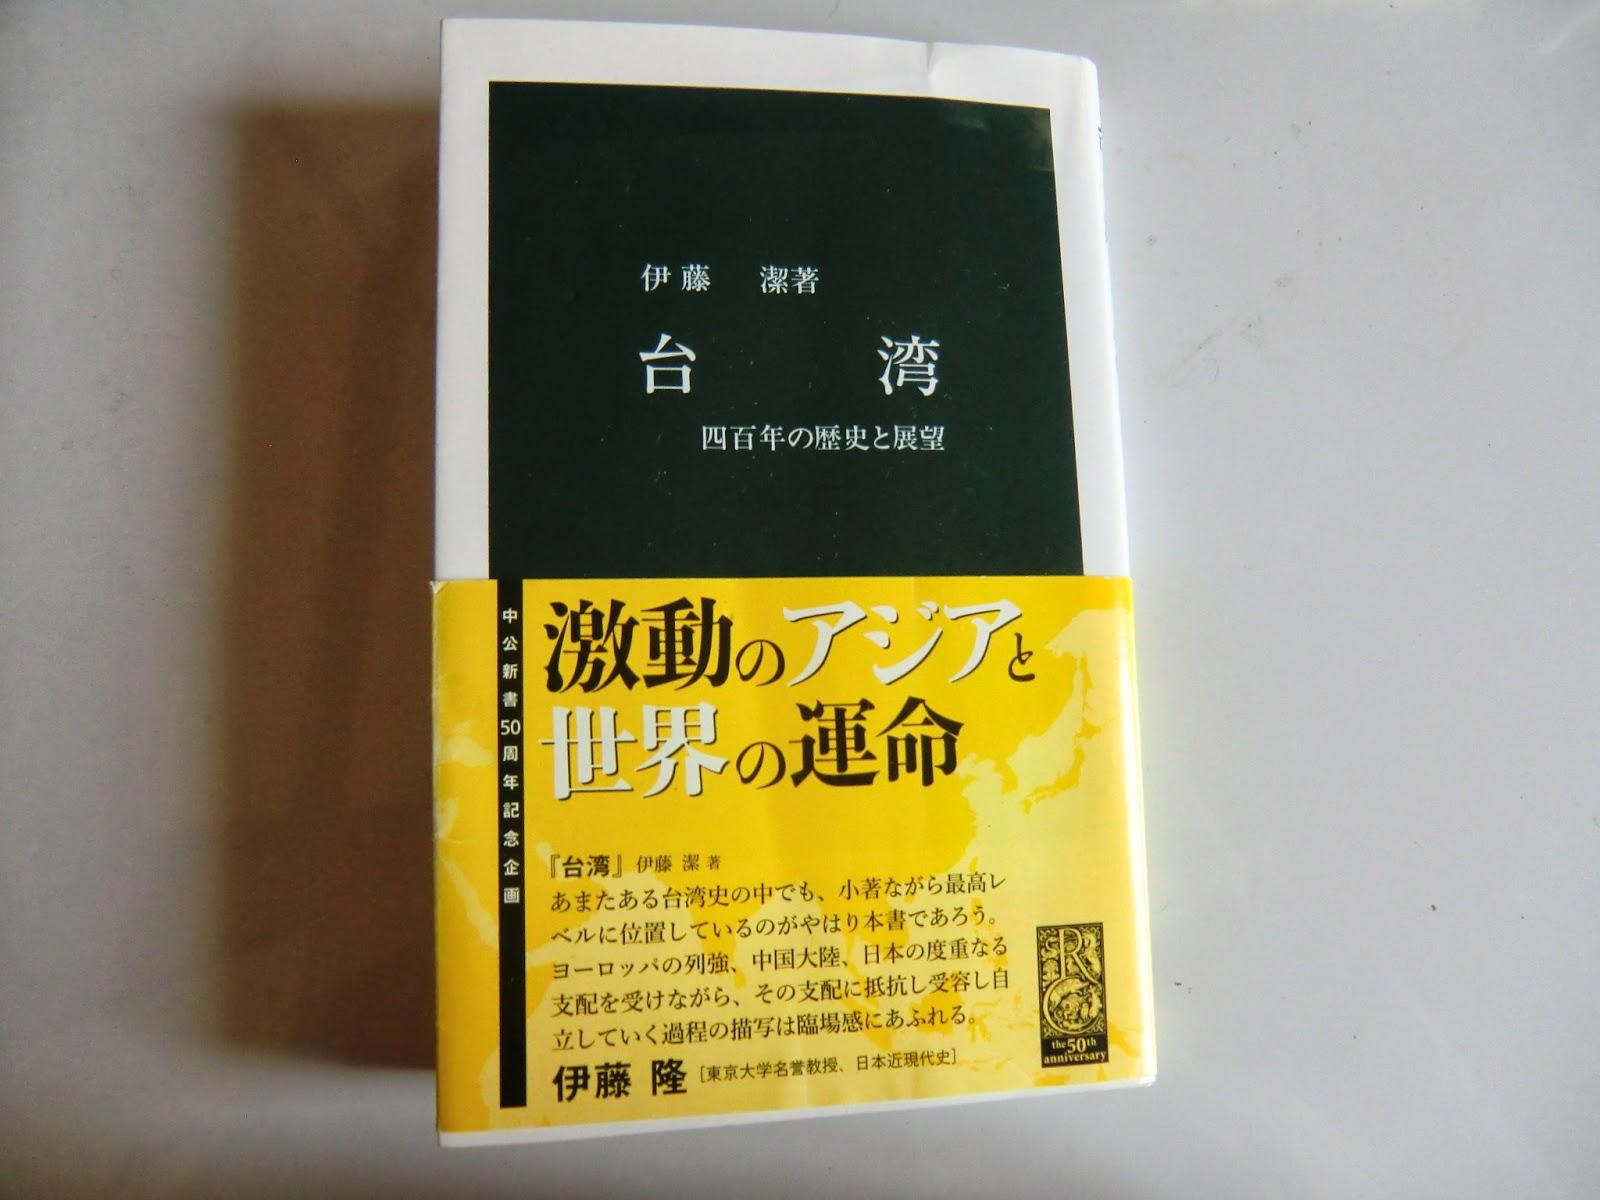 keiのかってにコラム: 『台湾(四百年の歴史と展望)』を読んで思うこと